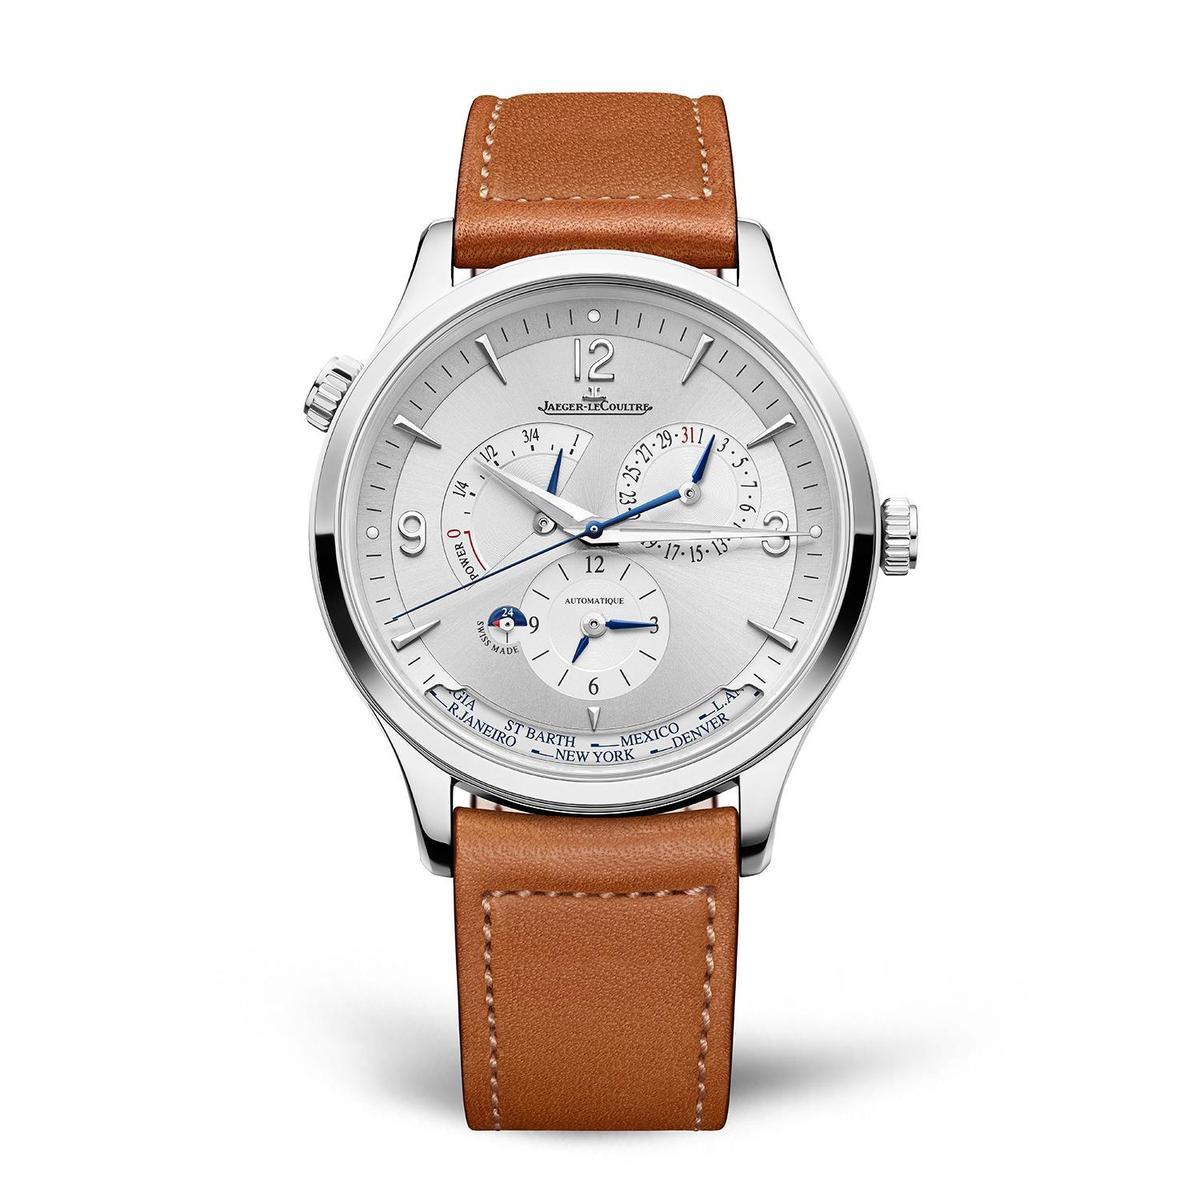 Master Control Geographic大師系列地理學家腕錶,40mm精鋼錶殼,裝載新一代939型自動上鏈機芯,具備矽材質擒縱裝置,動力儲存70小時,參考價約NT$385,000。